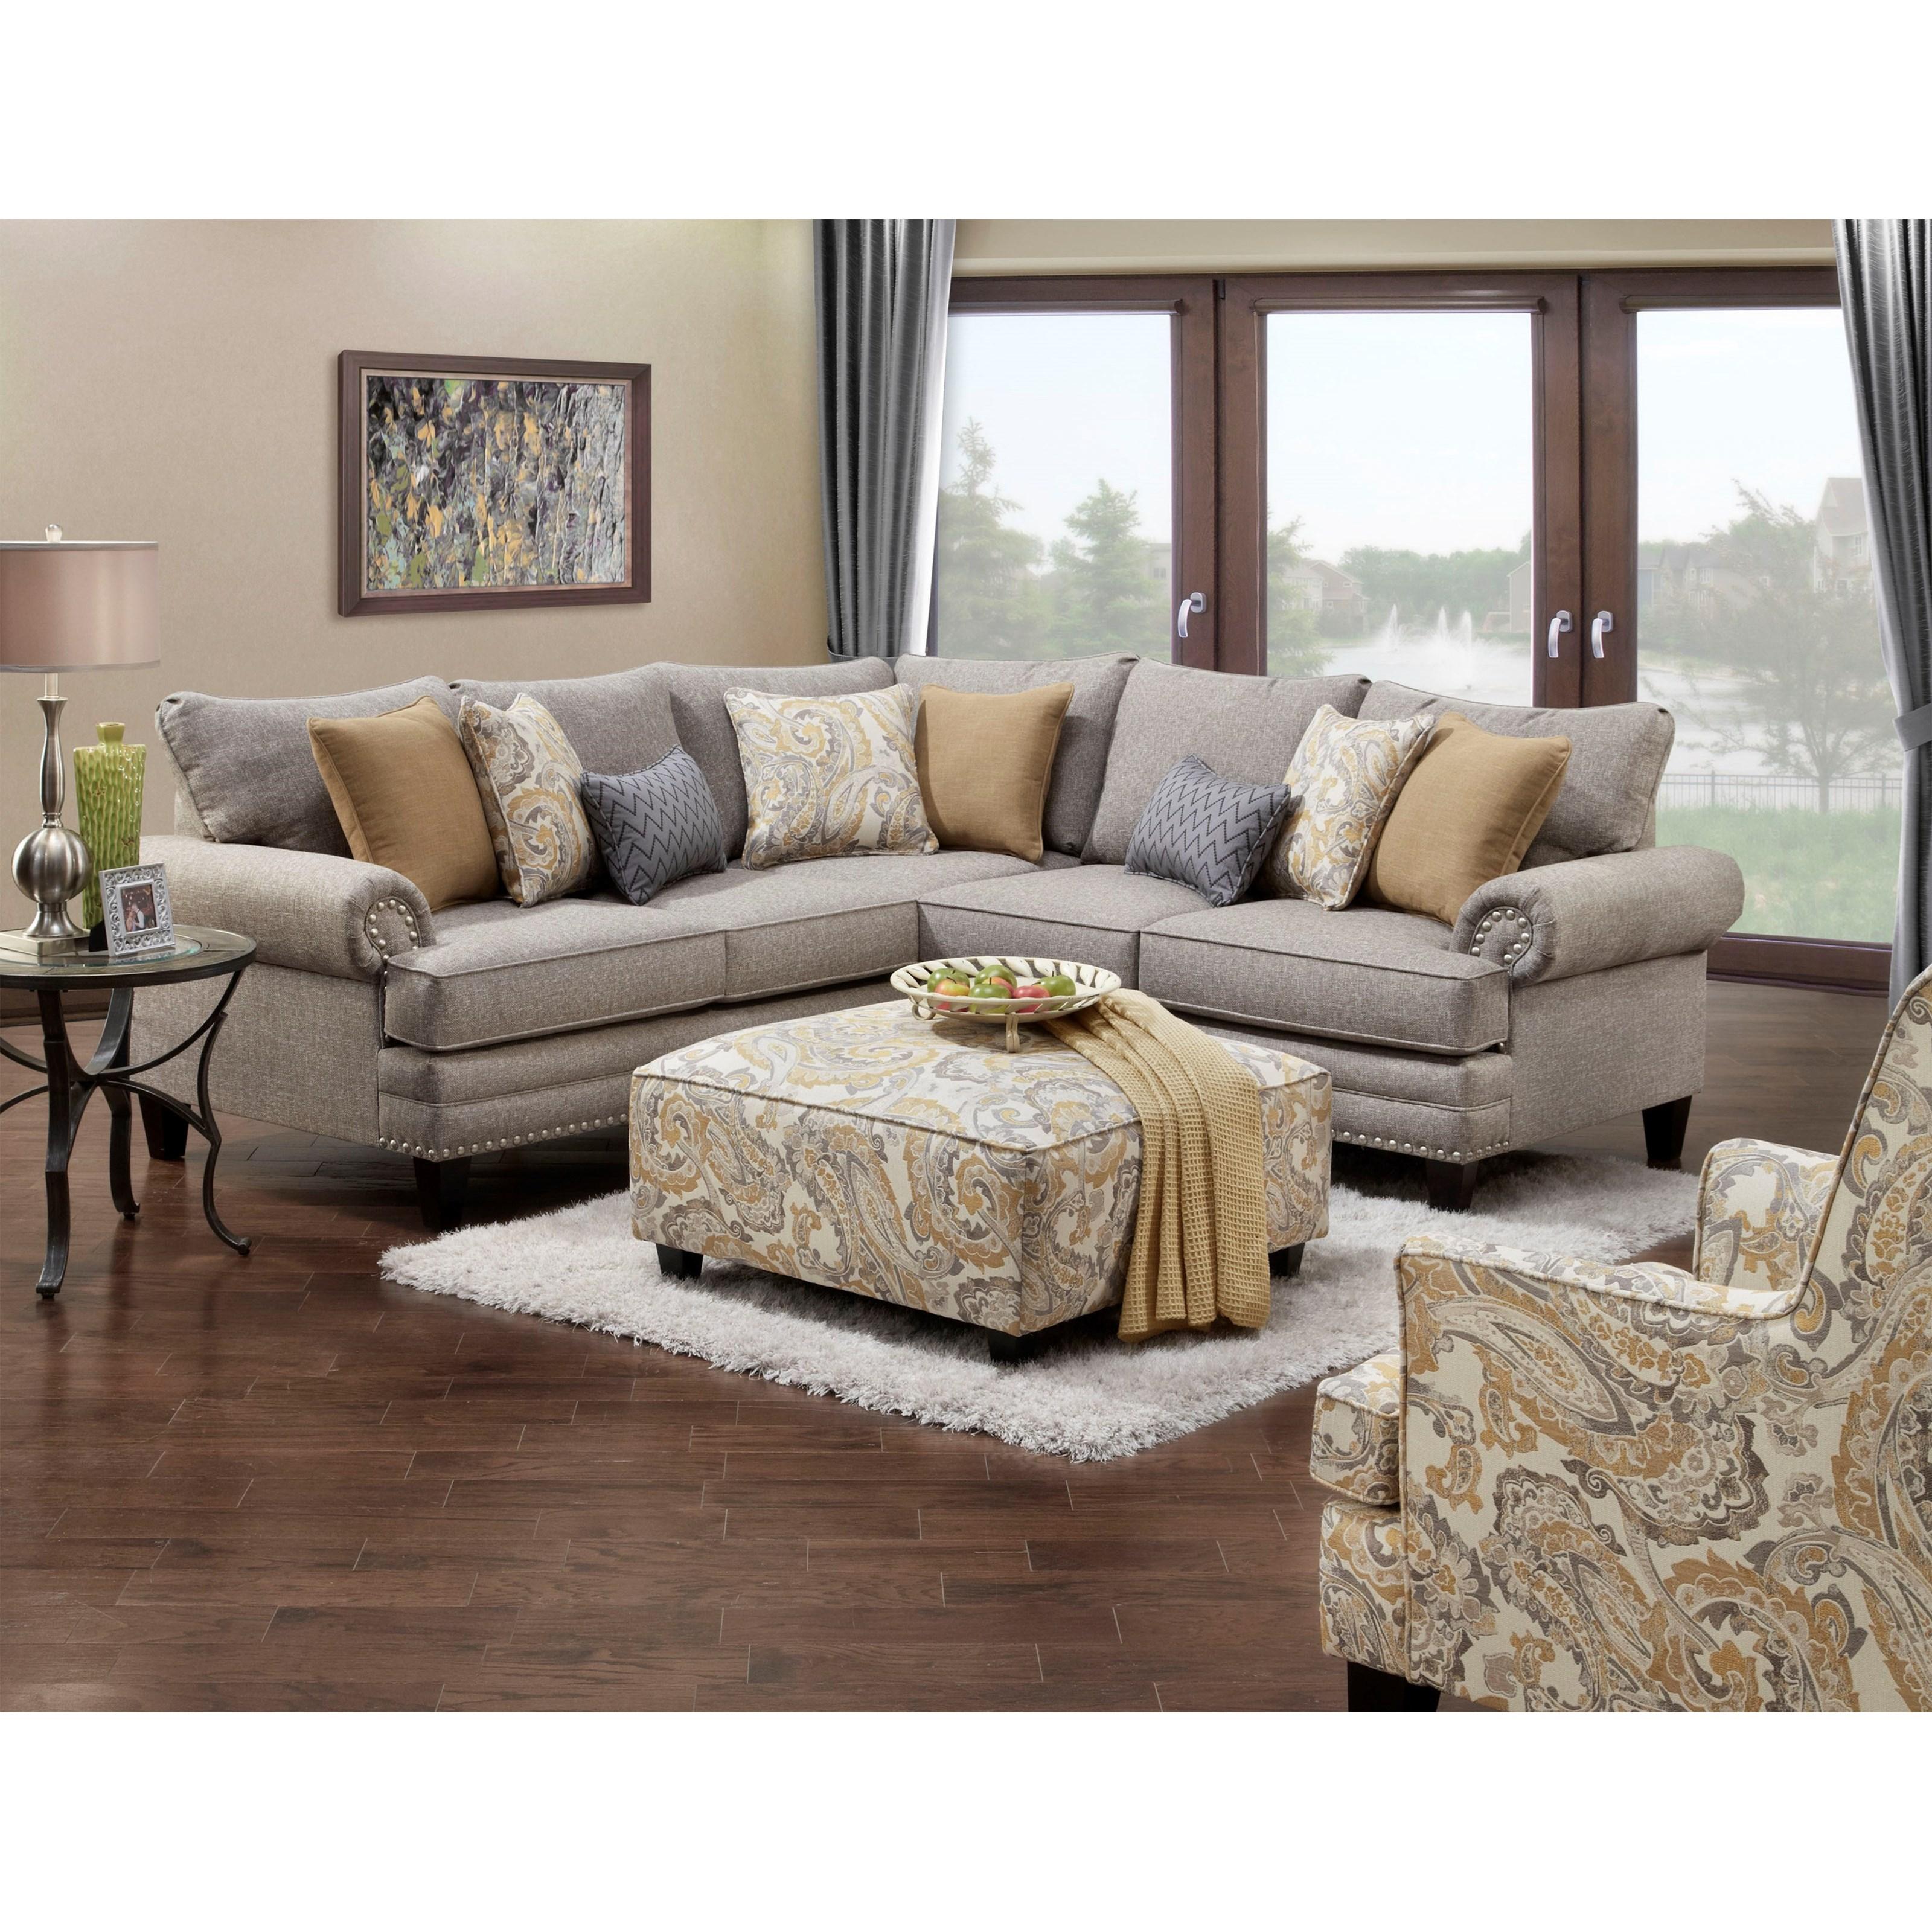 Haley Jordan 2836 2837 Stationary Living Room Group John V Schultz Furniture Stationary